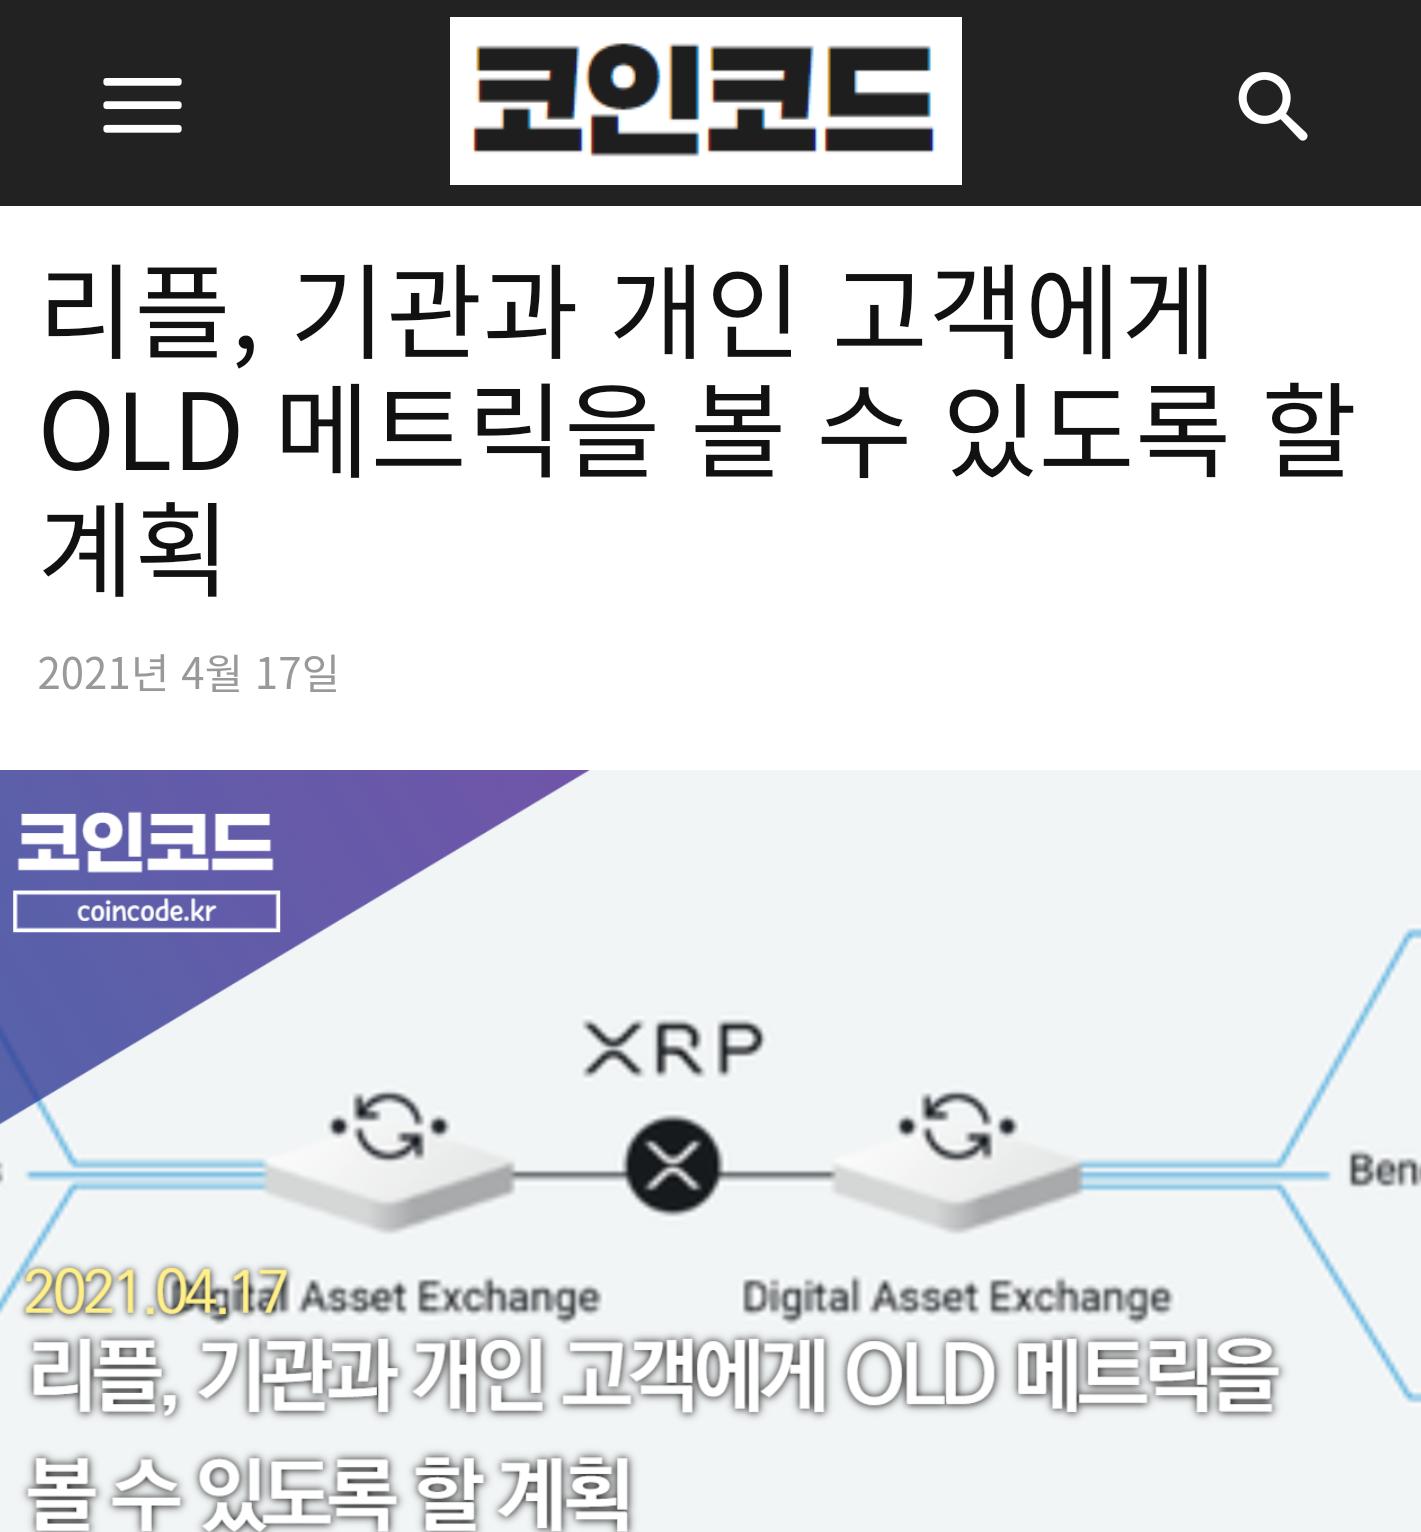 Capture+_2021-04-17-21-51-12(1).png : 리플(XRP) 웹사이트 OLD 메트릭 볼수있도록 함